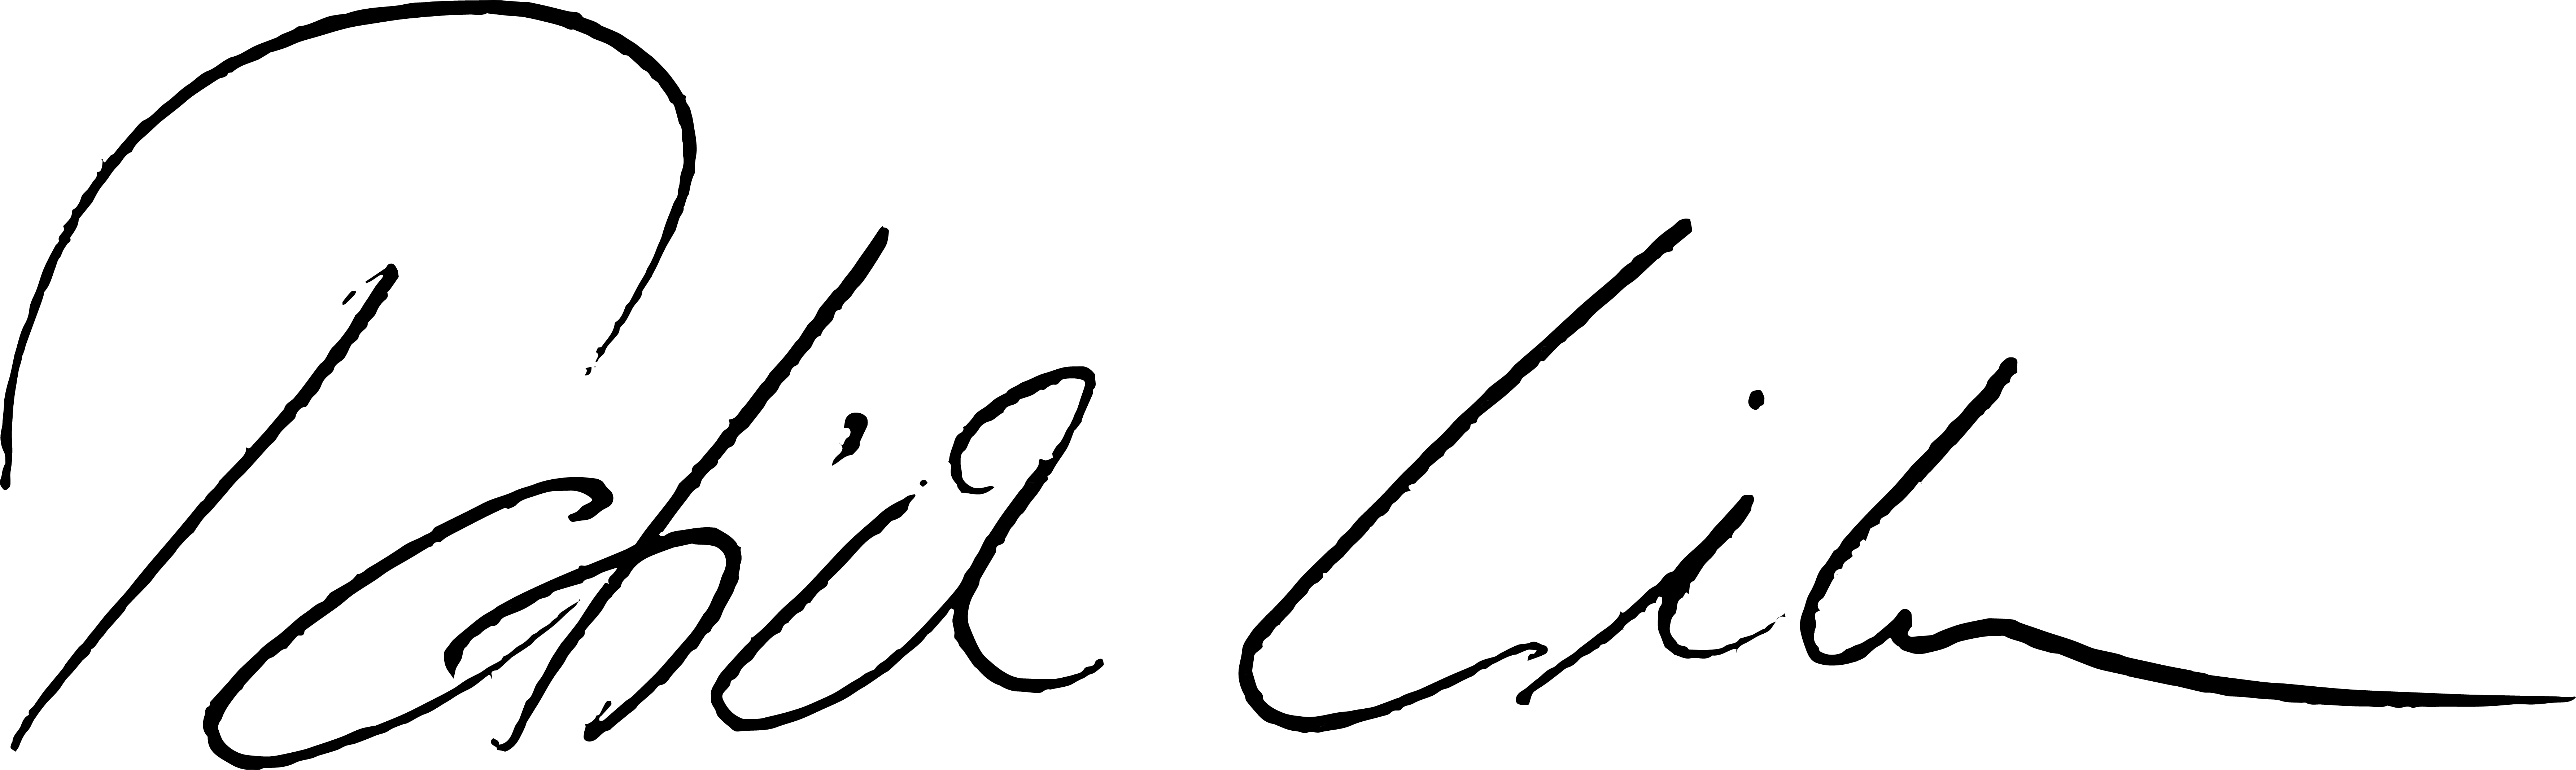 Linke Unterschrift